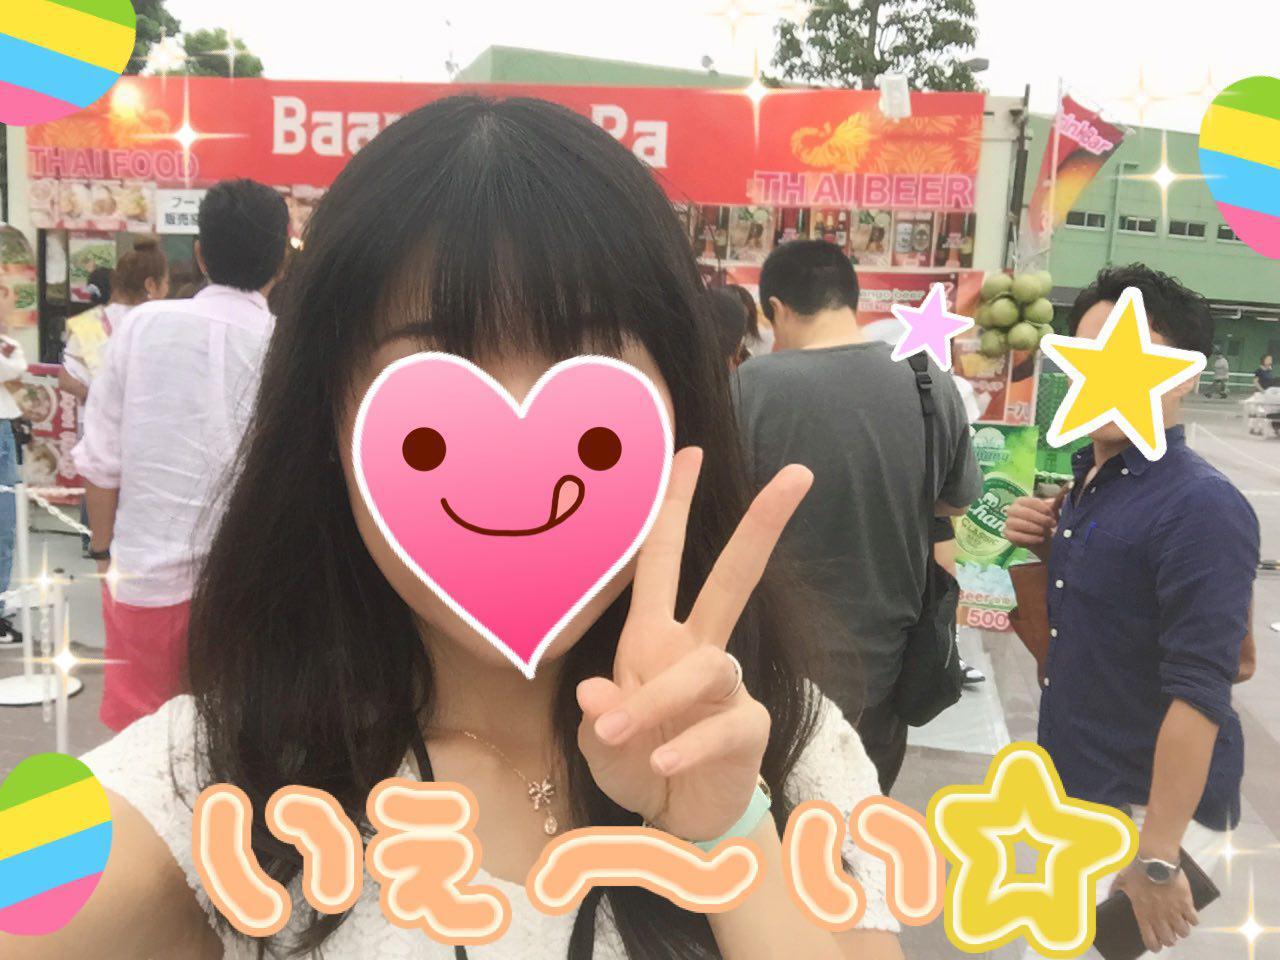 photo_2017-08-12_01-25-32.jpg